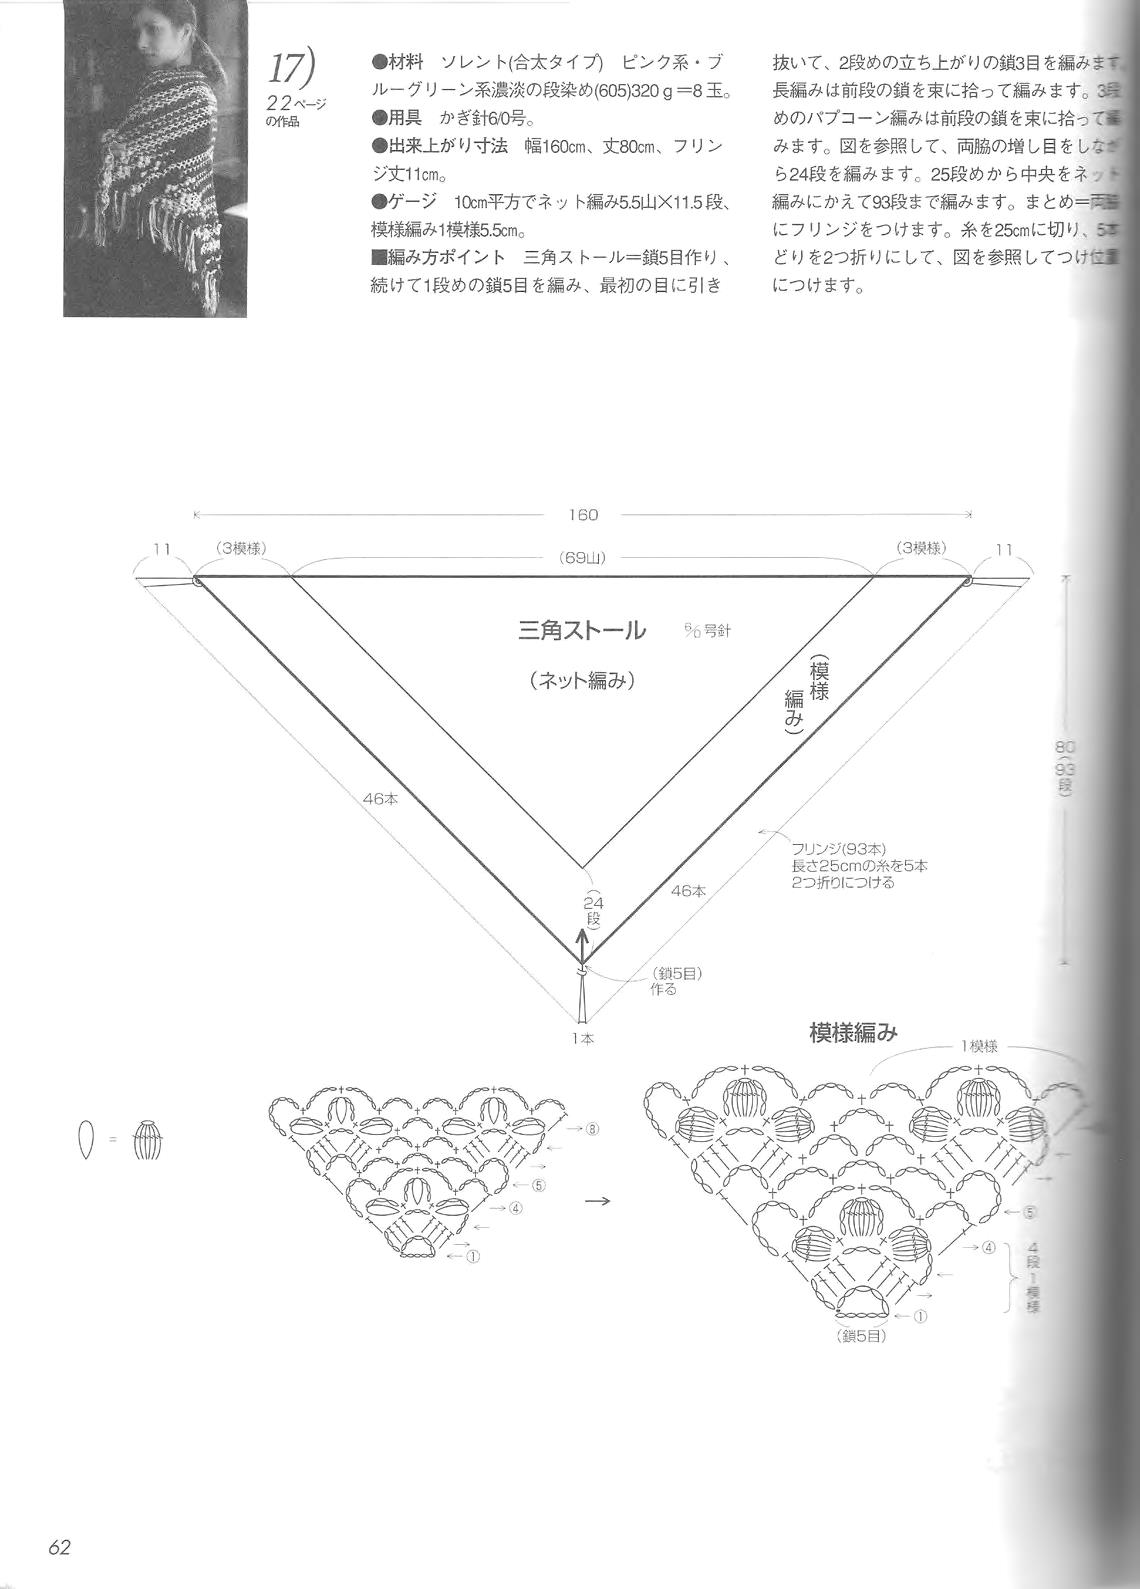 Let's knit series NV4375 2008 M-L sp-kr_62